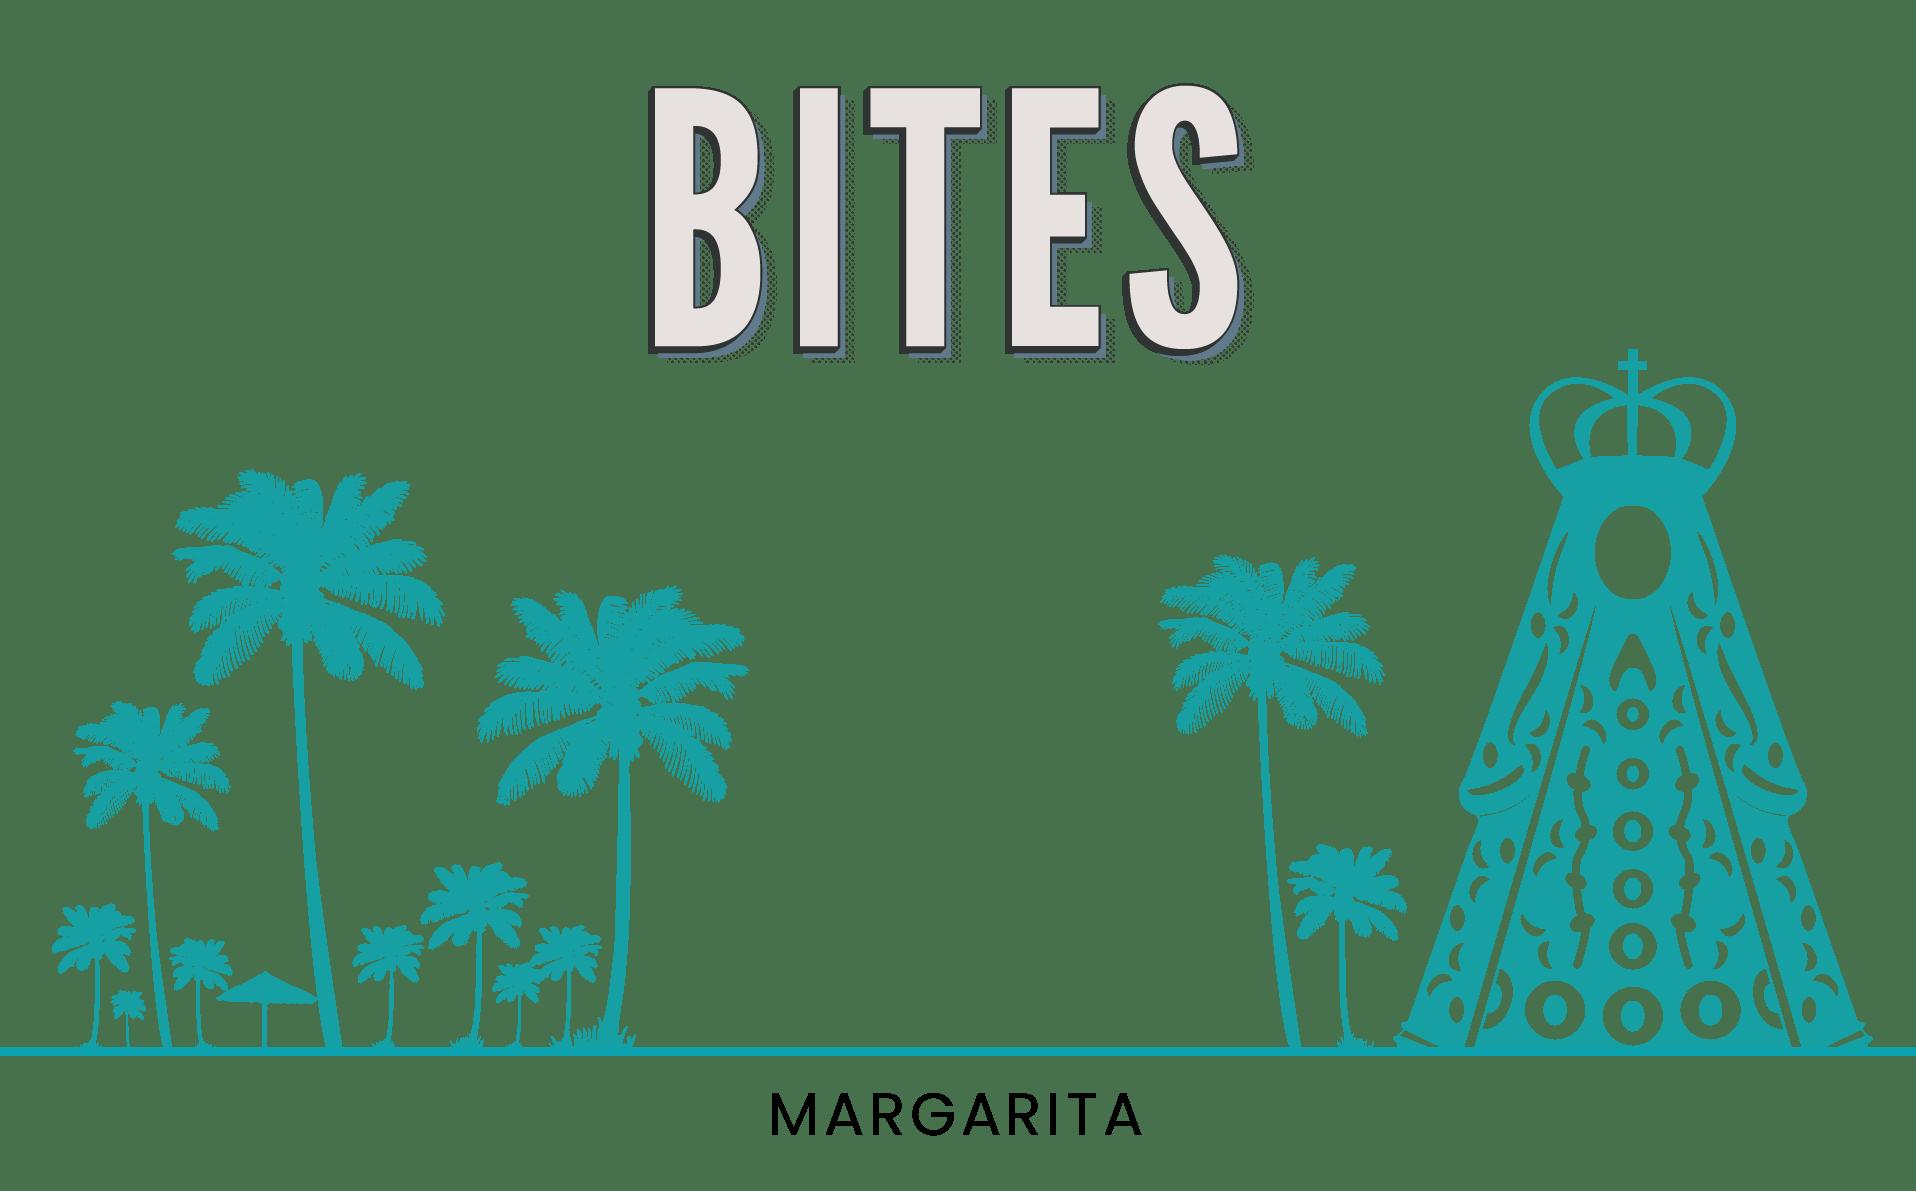 MARGARITA_1